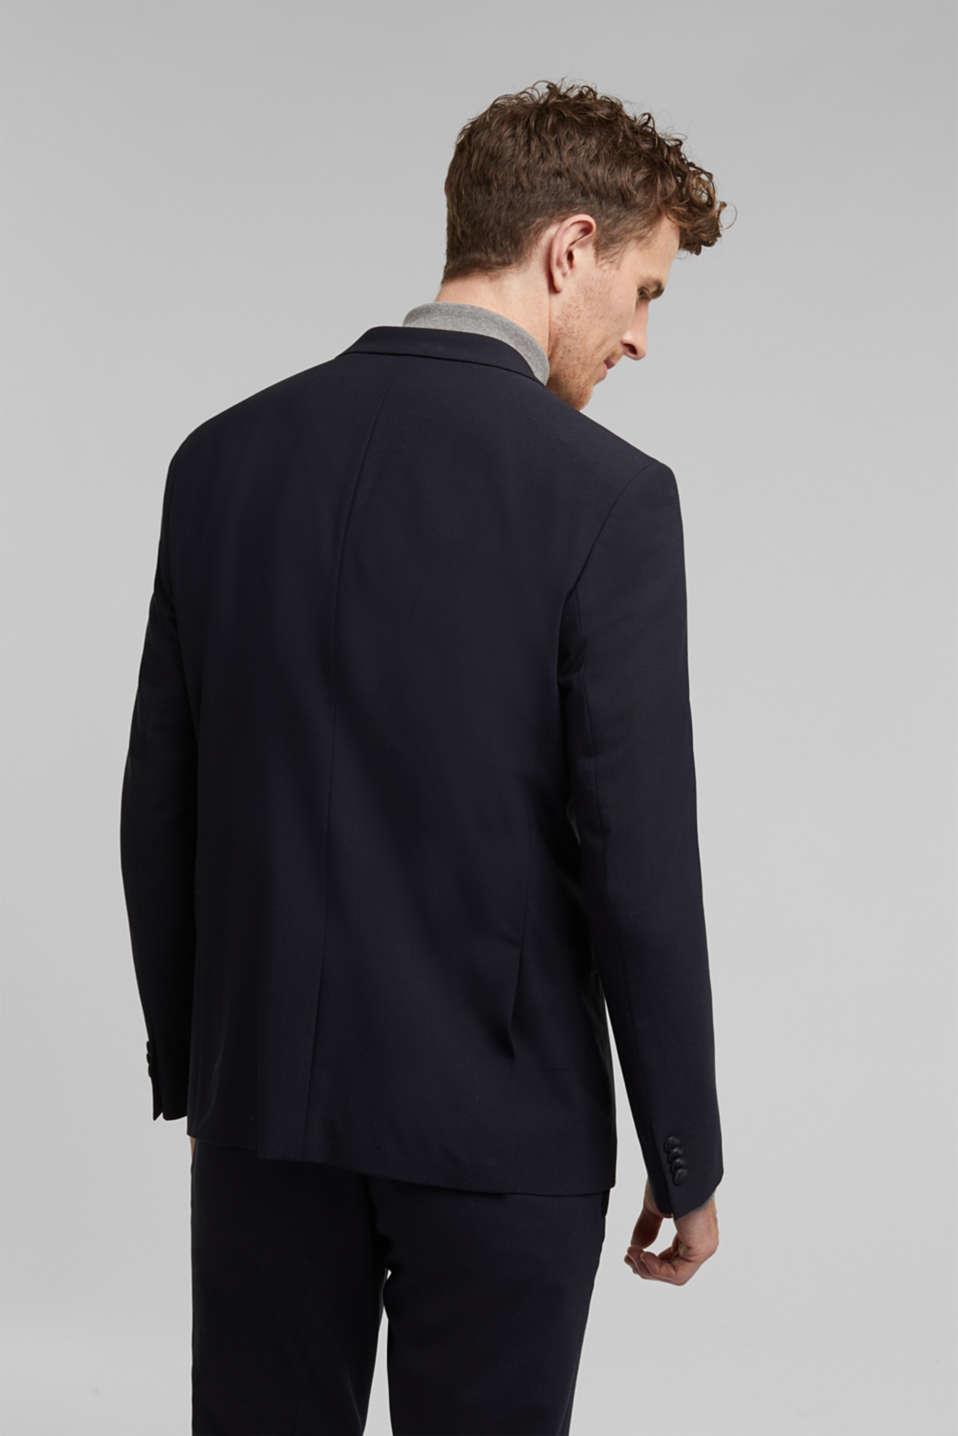 ACTIVE SUIT tailored jacket, wool blend, DARK BLUE, detail image number 3